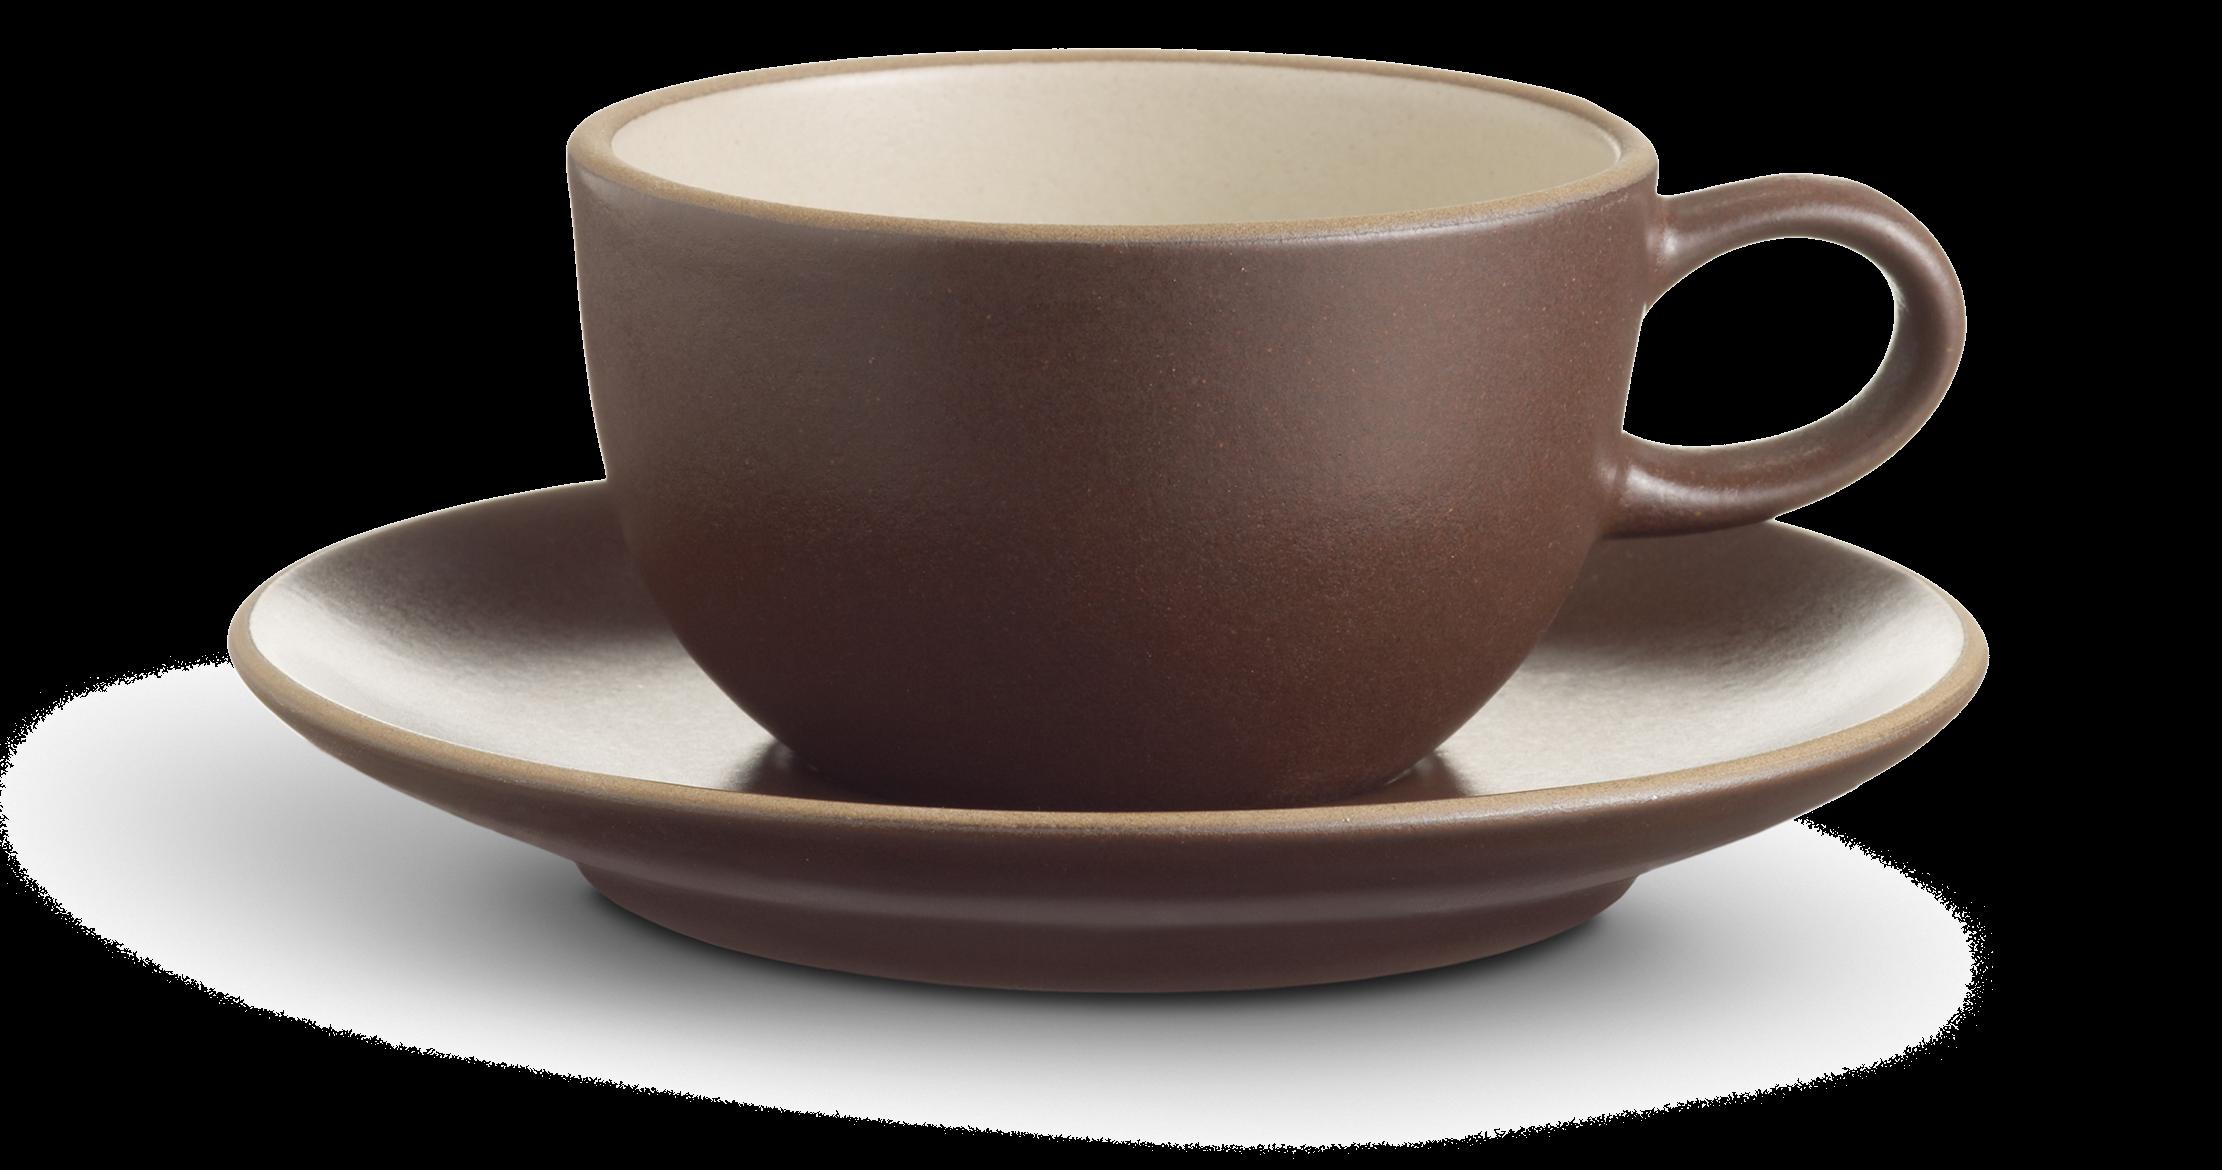 Tea Cup PNG Clipart - PNG Cup Of Tea